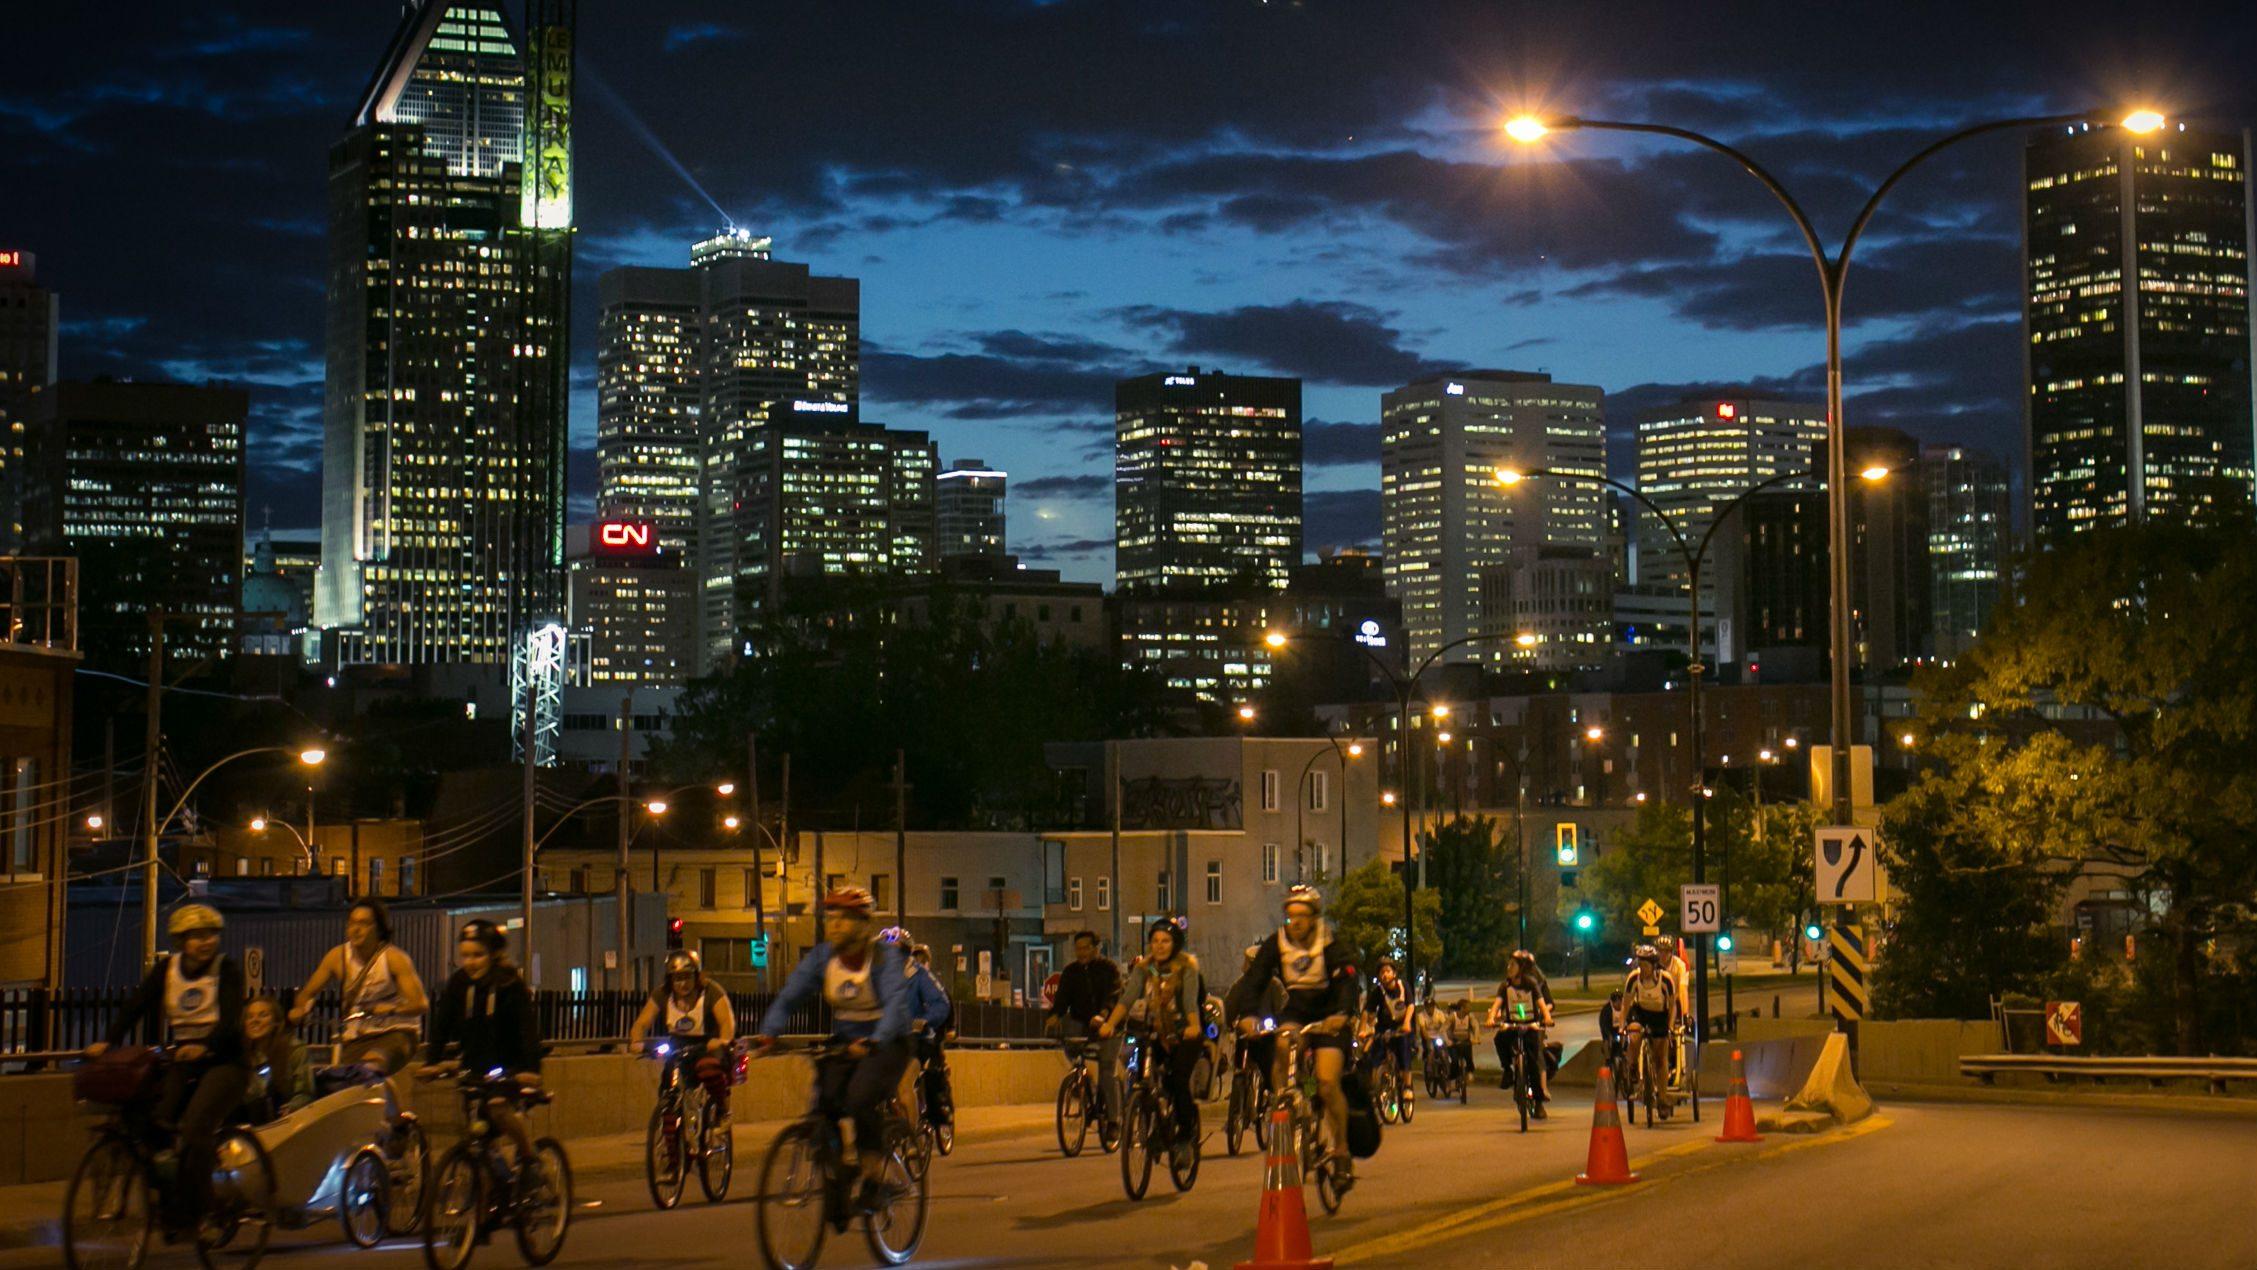 night biking gear 2017, tour de velo montreal